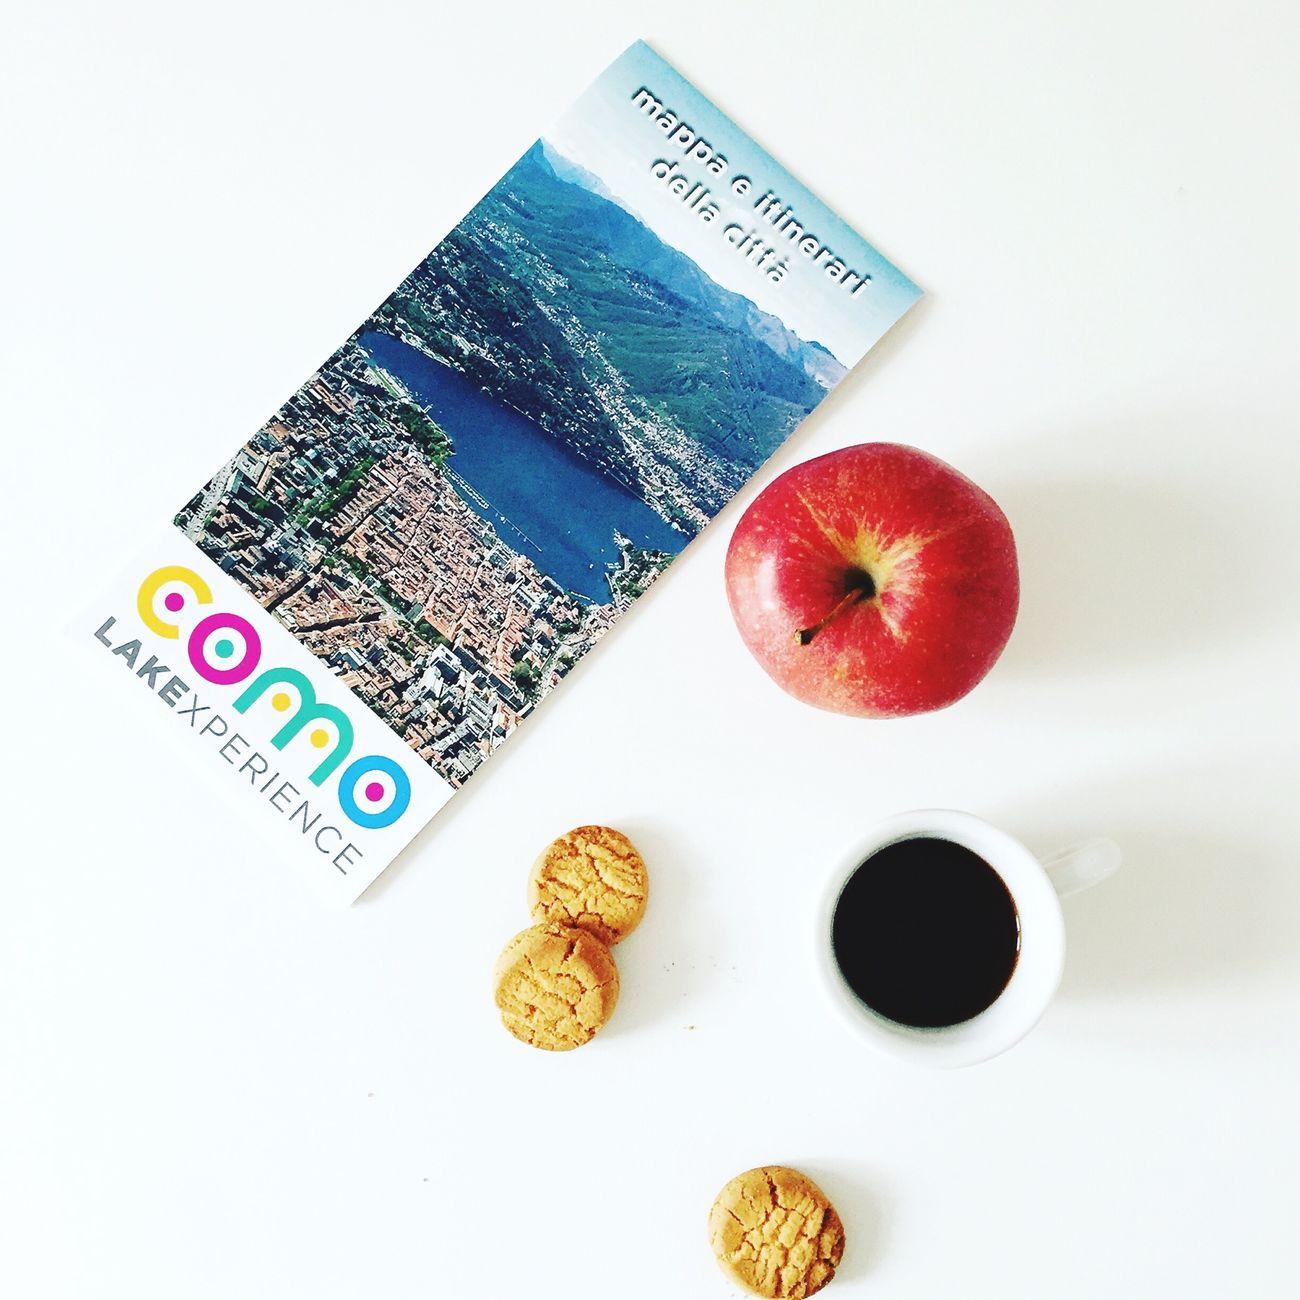 sıαмσ αppєиα αgℓı ıиızı . Foodphotography EyeEm Best Edits Food Coffee Coffee Time Biscuits Apple Como Lake Lakexperience